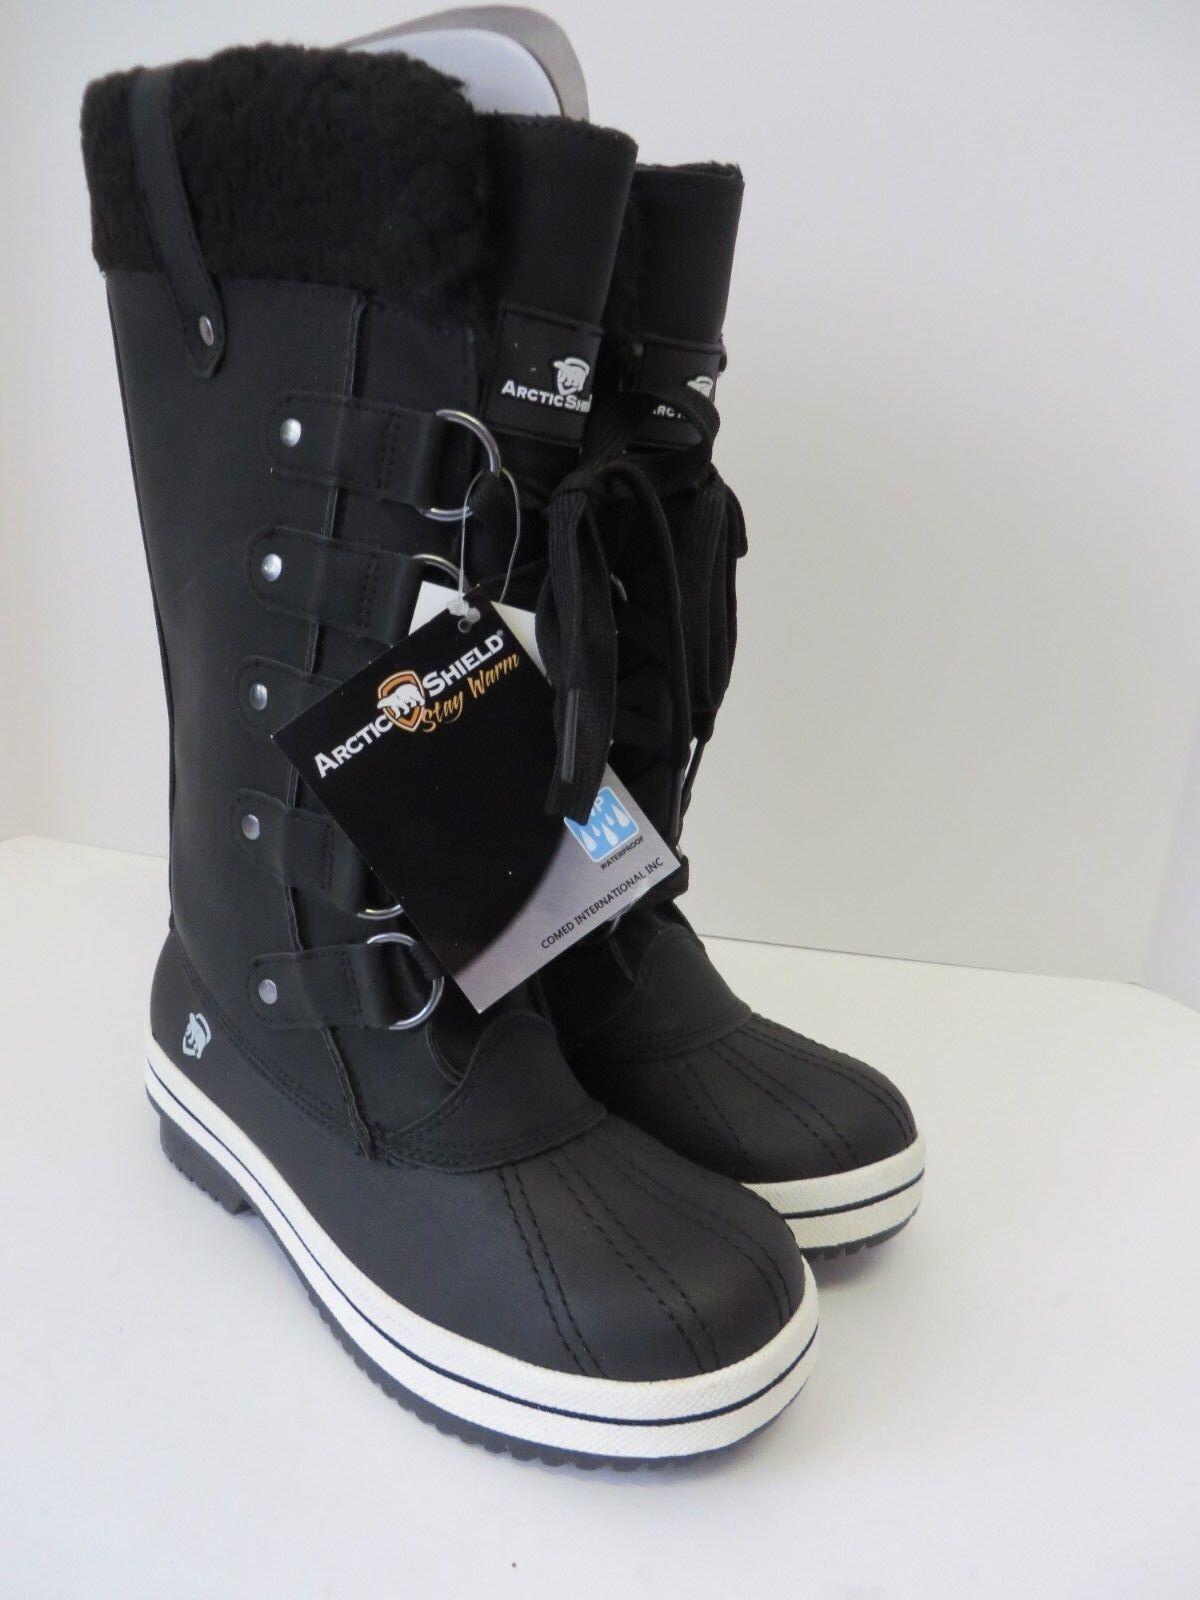 c4ab7676 ARCTIC Shield mujer Snow Aislado Impermeable Negro nuevo para bota  nowgws5548-Botas